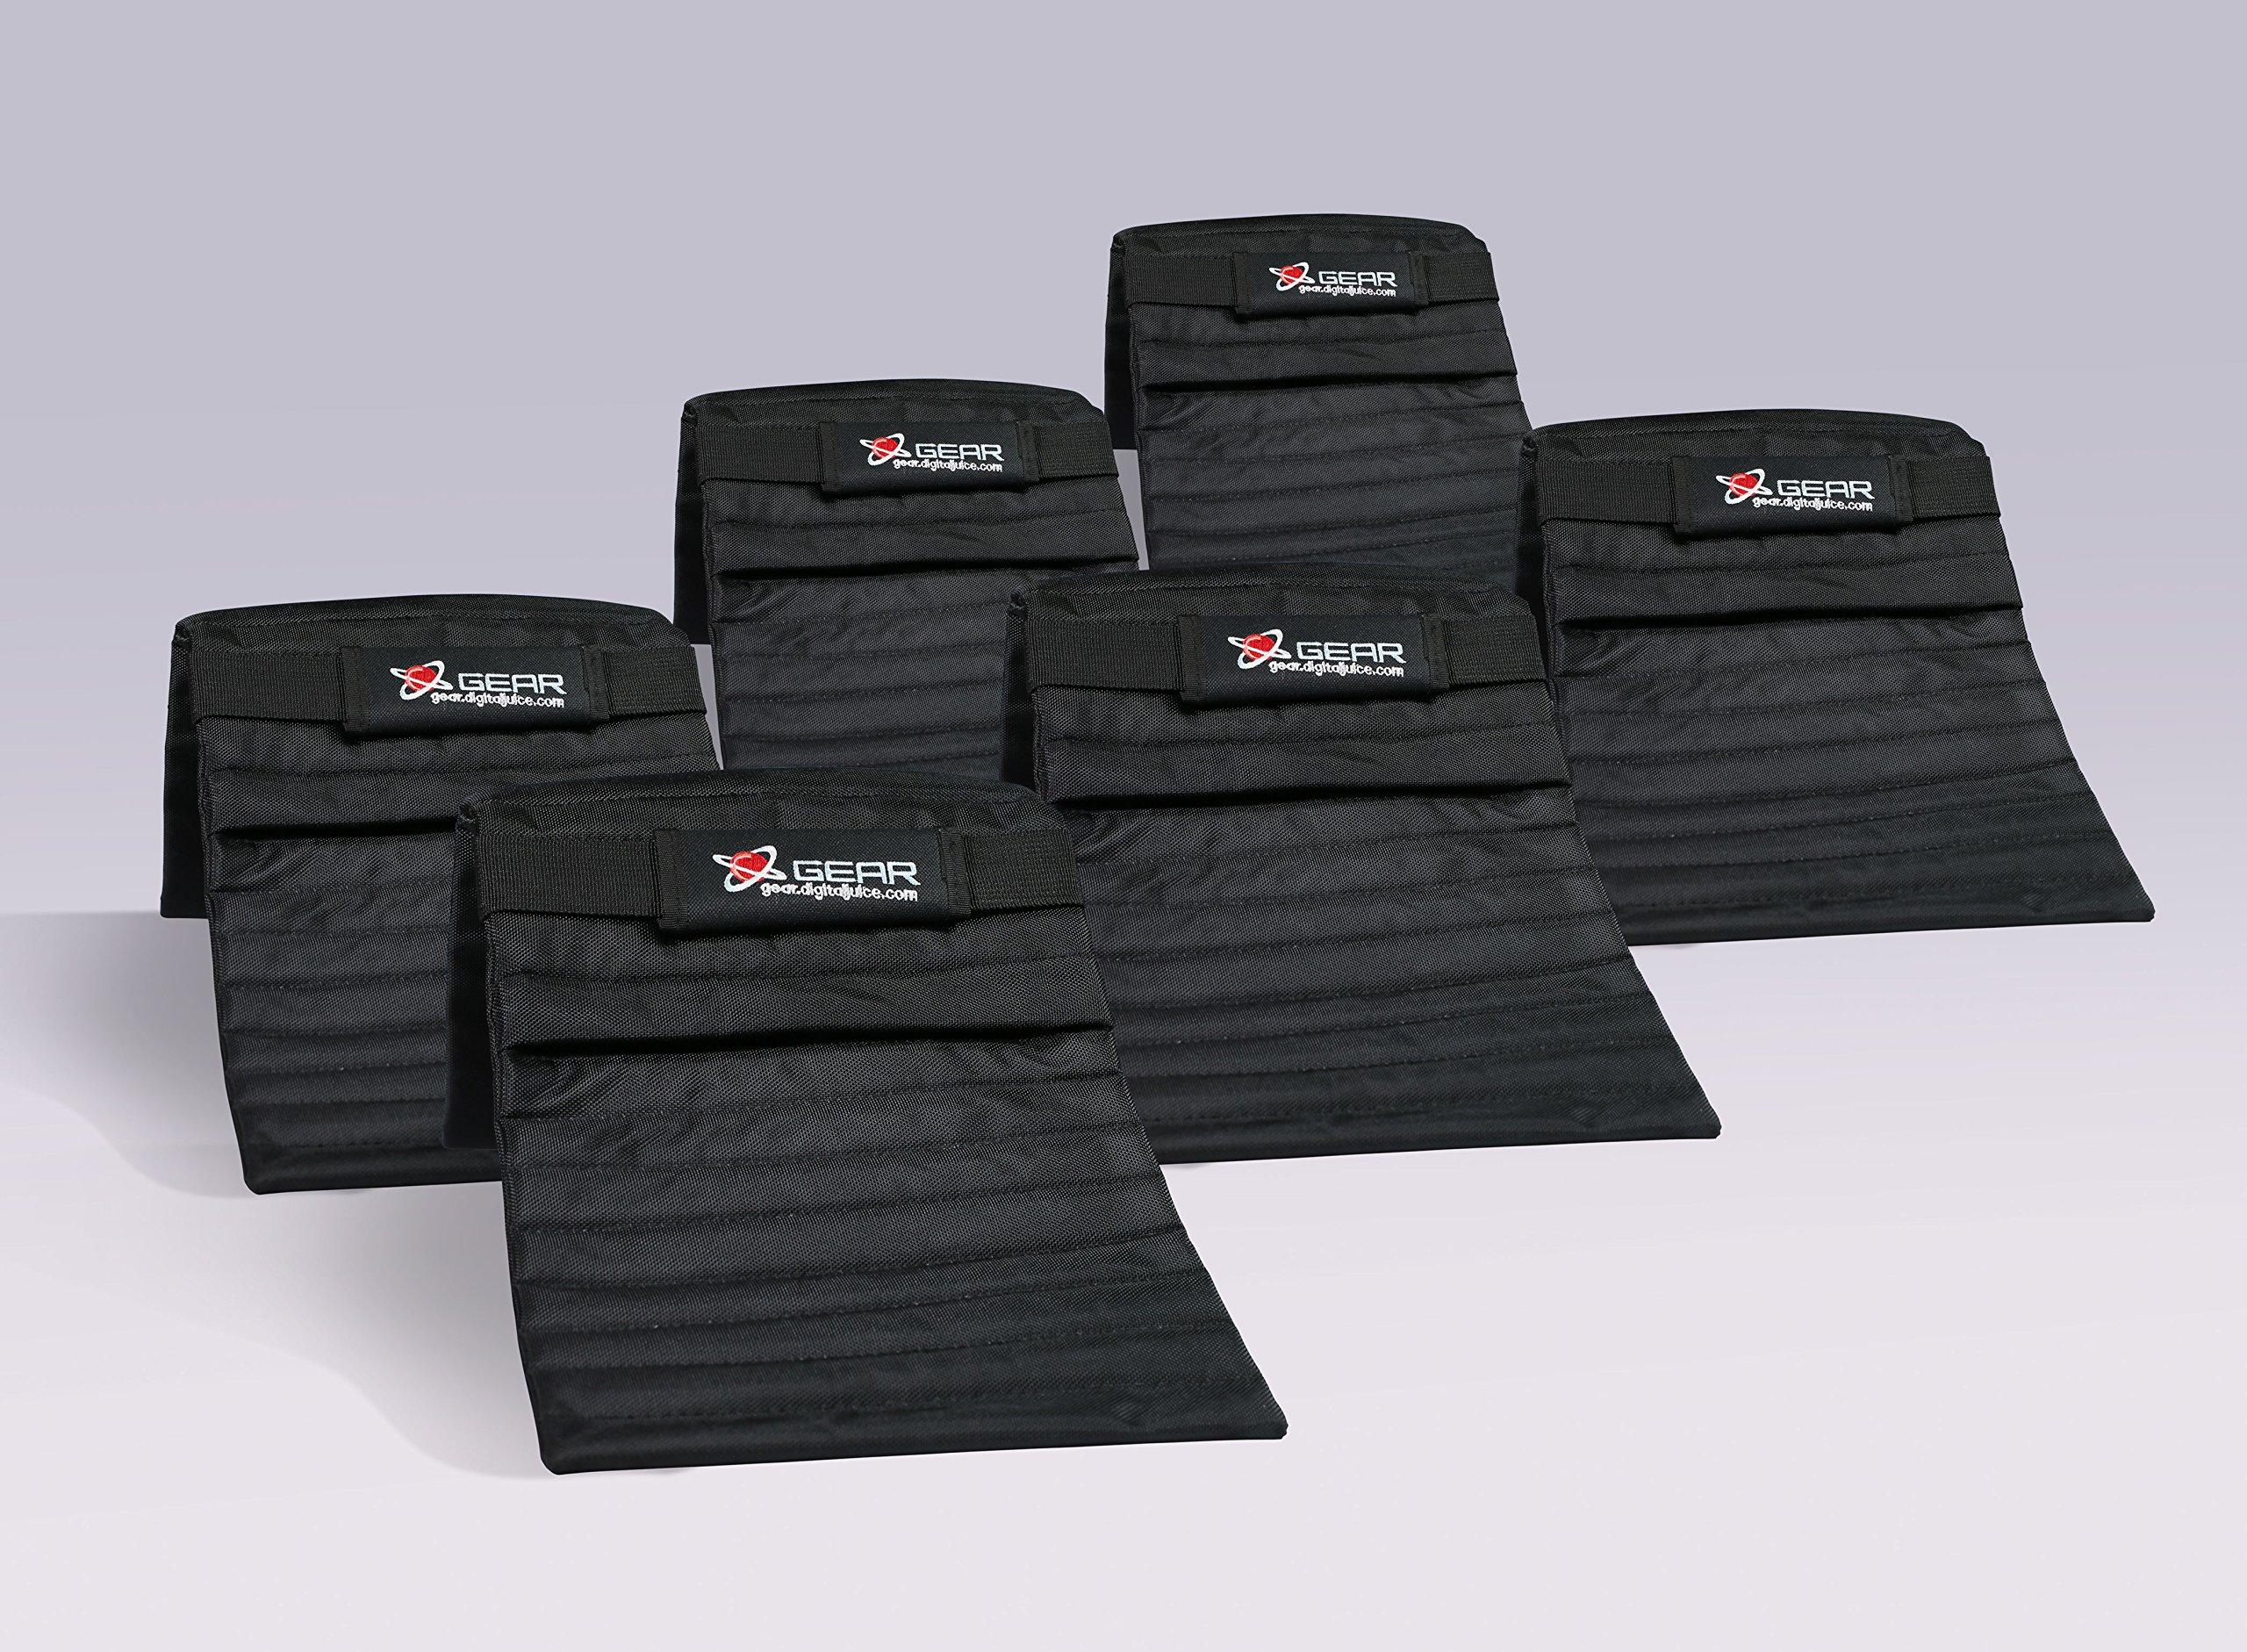 Digital Juice Black Sand Bag for Photography; Affordable Heavy Duty Saddlebag Design, Saddle Sandbags for Photo Studio Video Light Stands, tripods, Lighting Accessories (Black); Without Sand (6 Pack) by Digital Juice